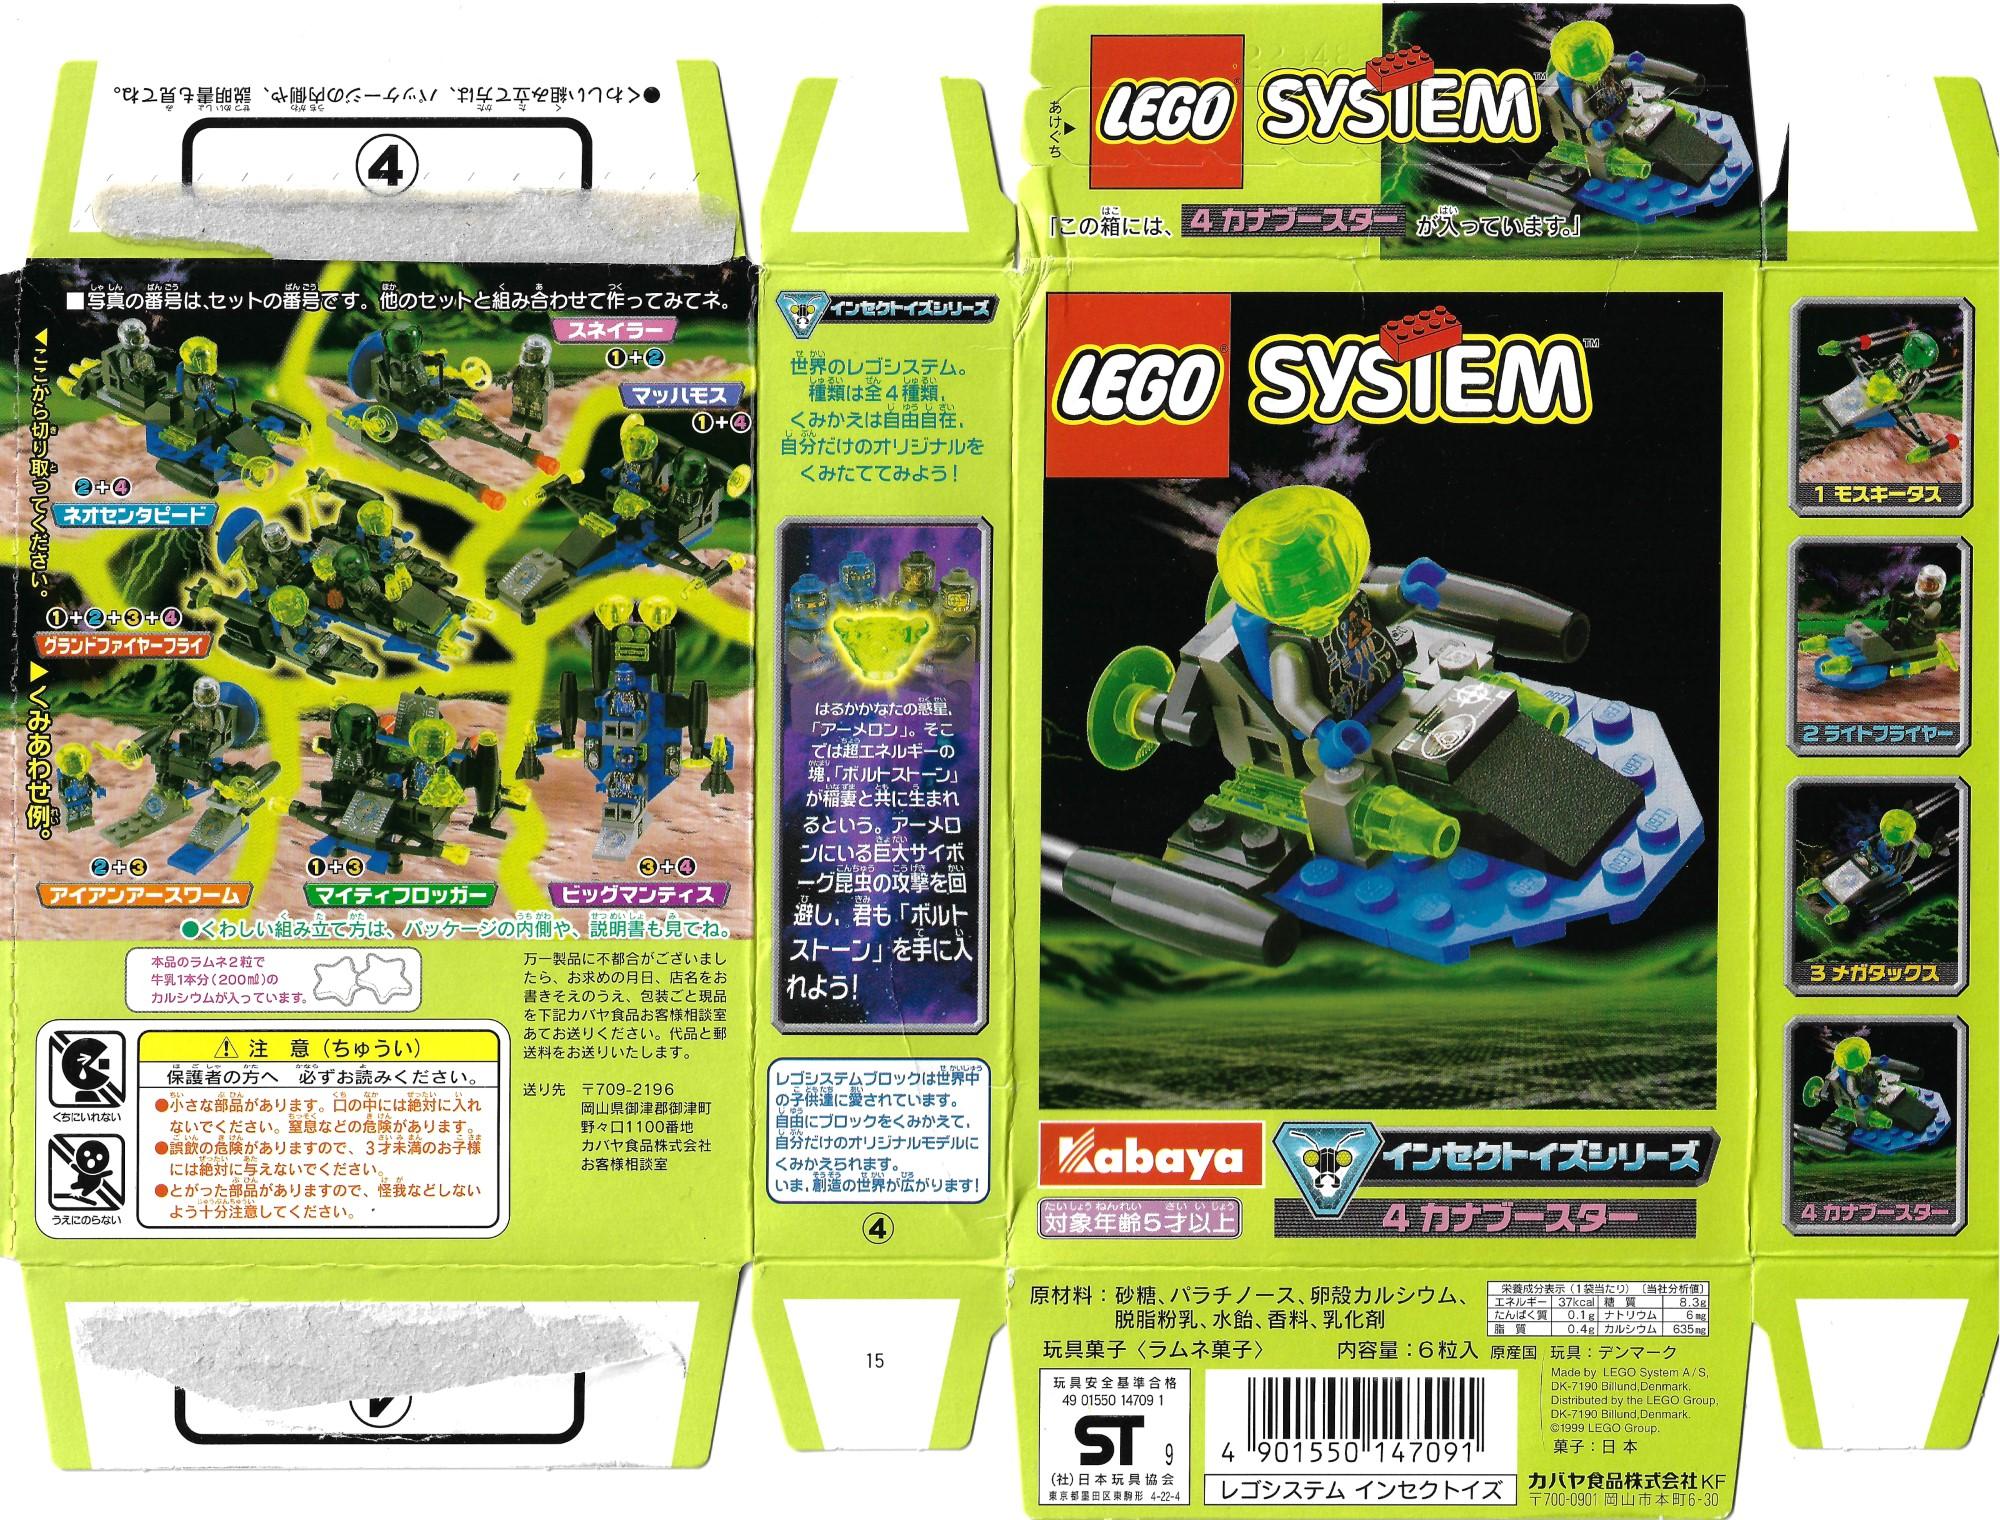 LEGO Insectoids Kabaya 3073 Booster Box Aussen Scan